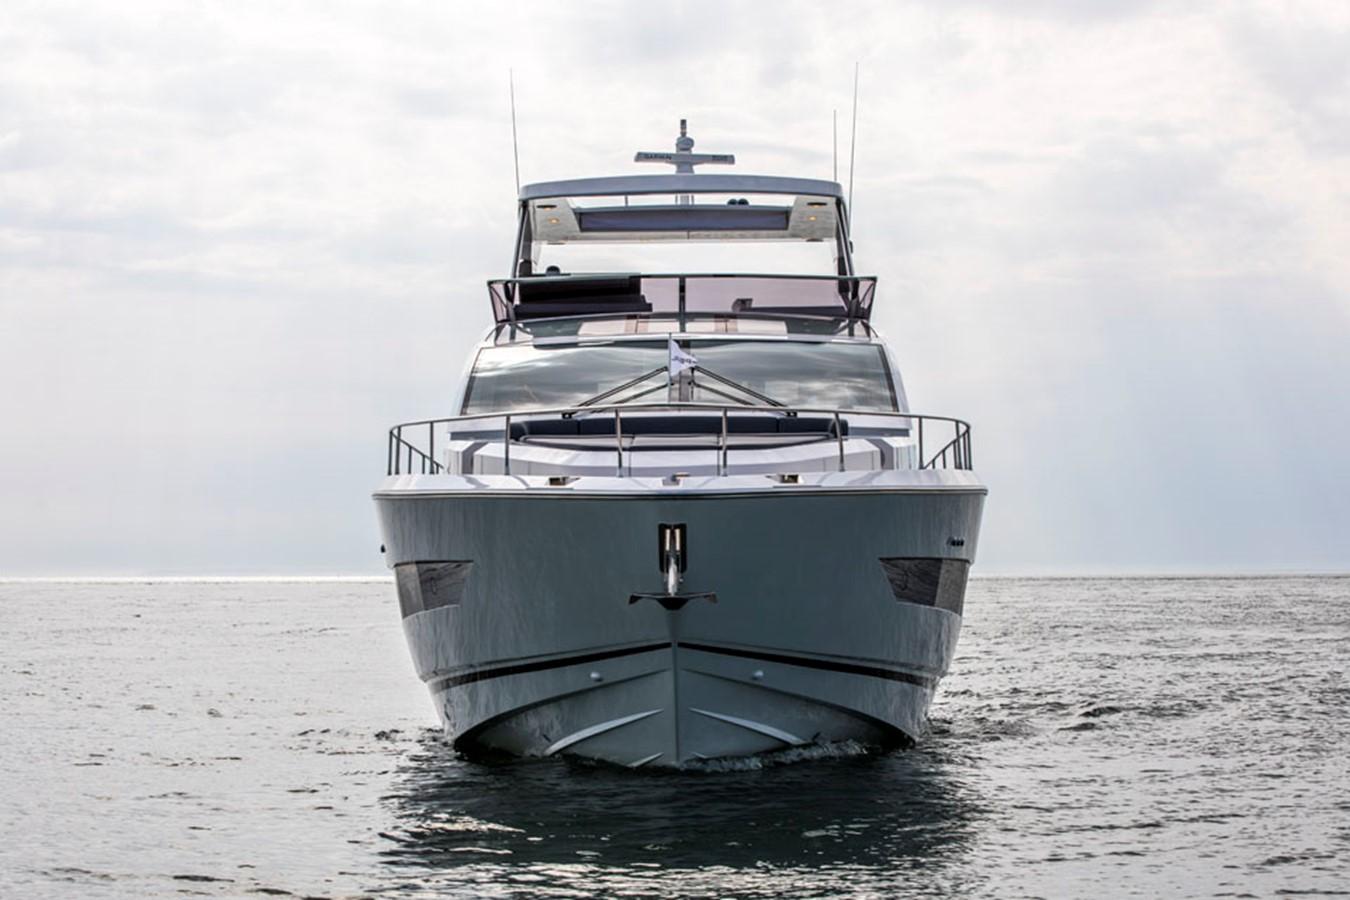 2019 PEARL MOTOR YACHTS Pearl 80 Motor Yacht 2615320